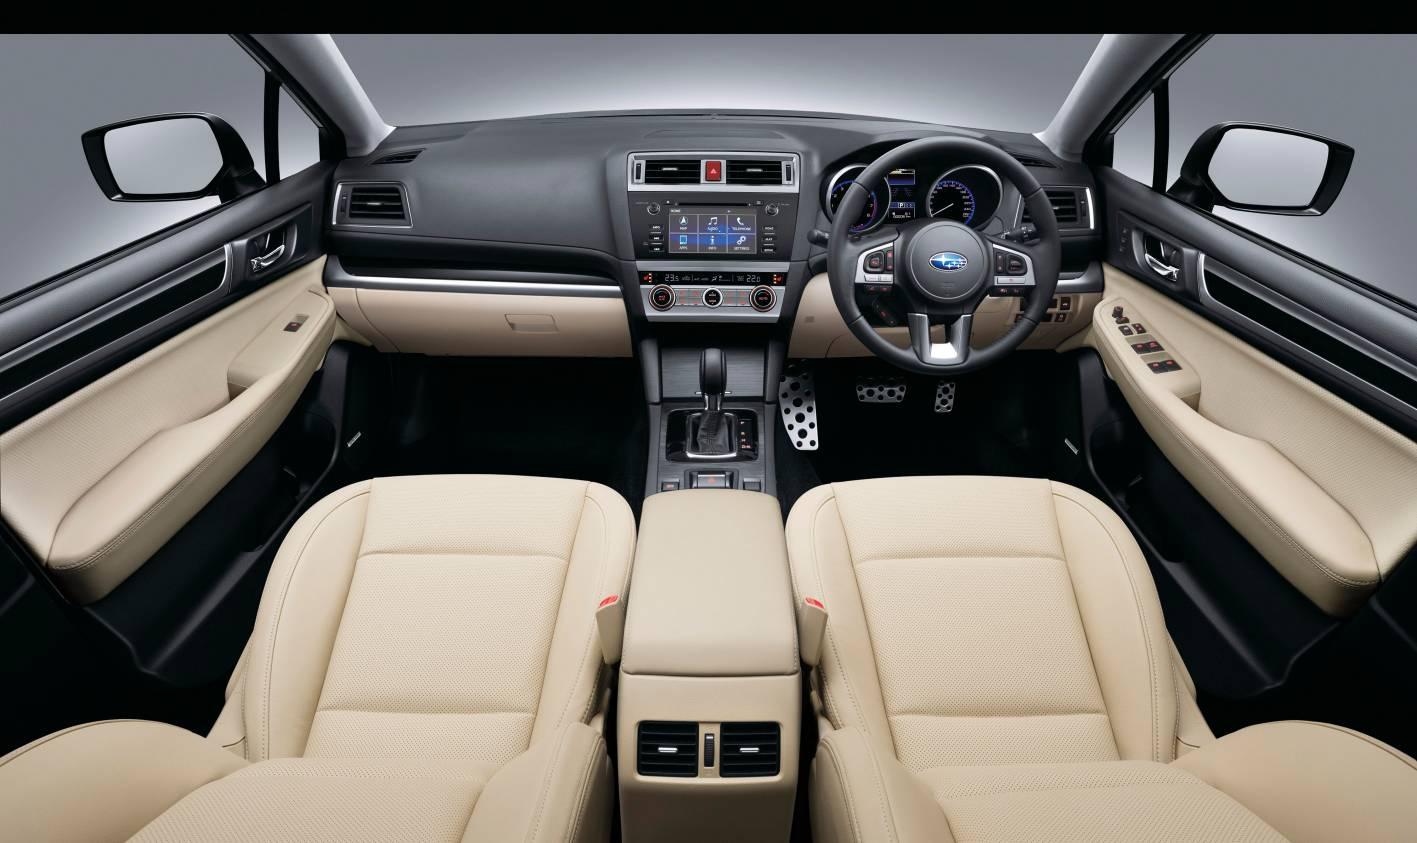 2015 Subaru Liberty On Sale In Australia From 29 990 Performancedrive